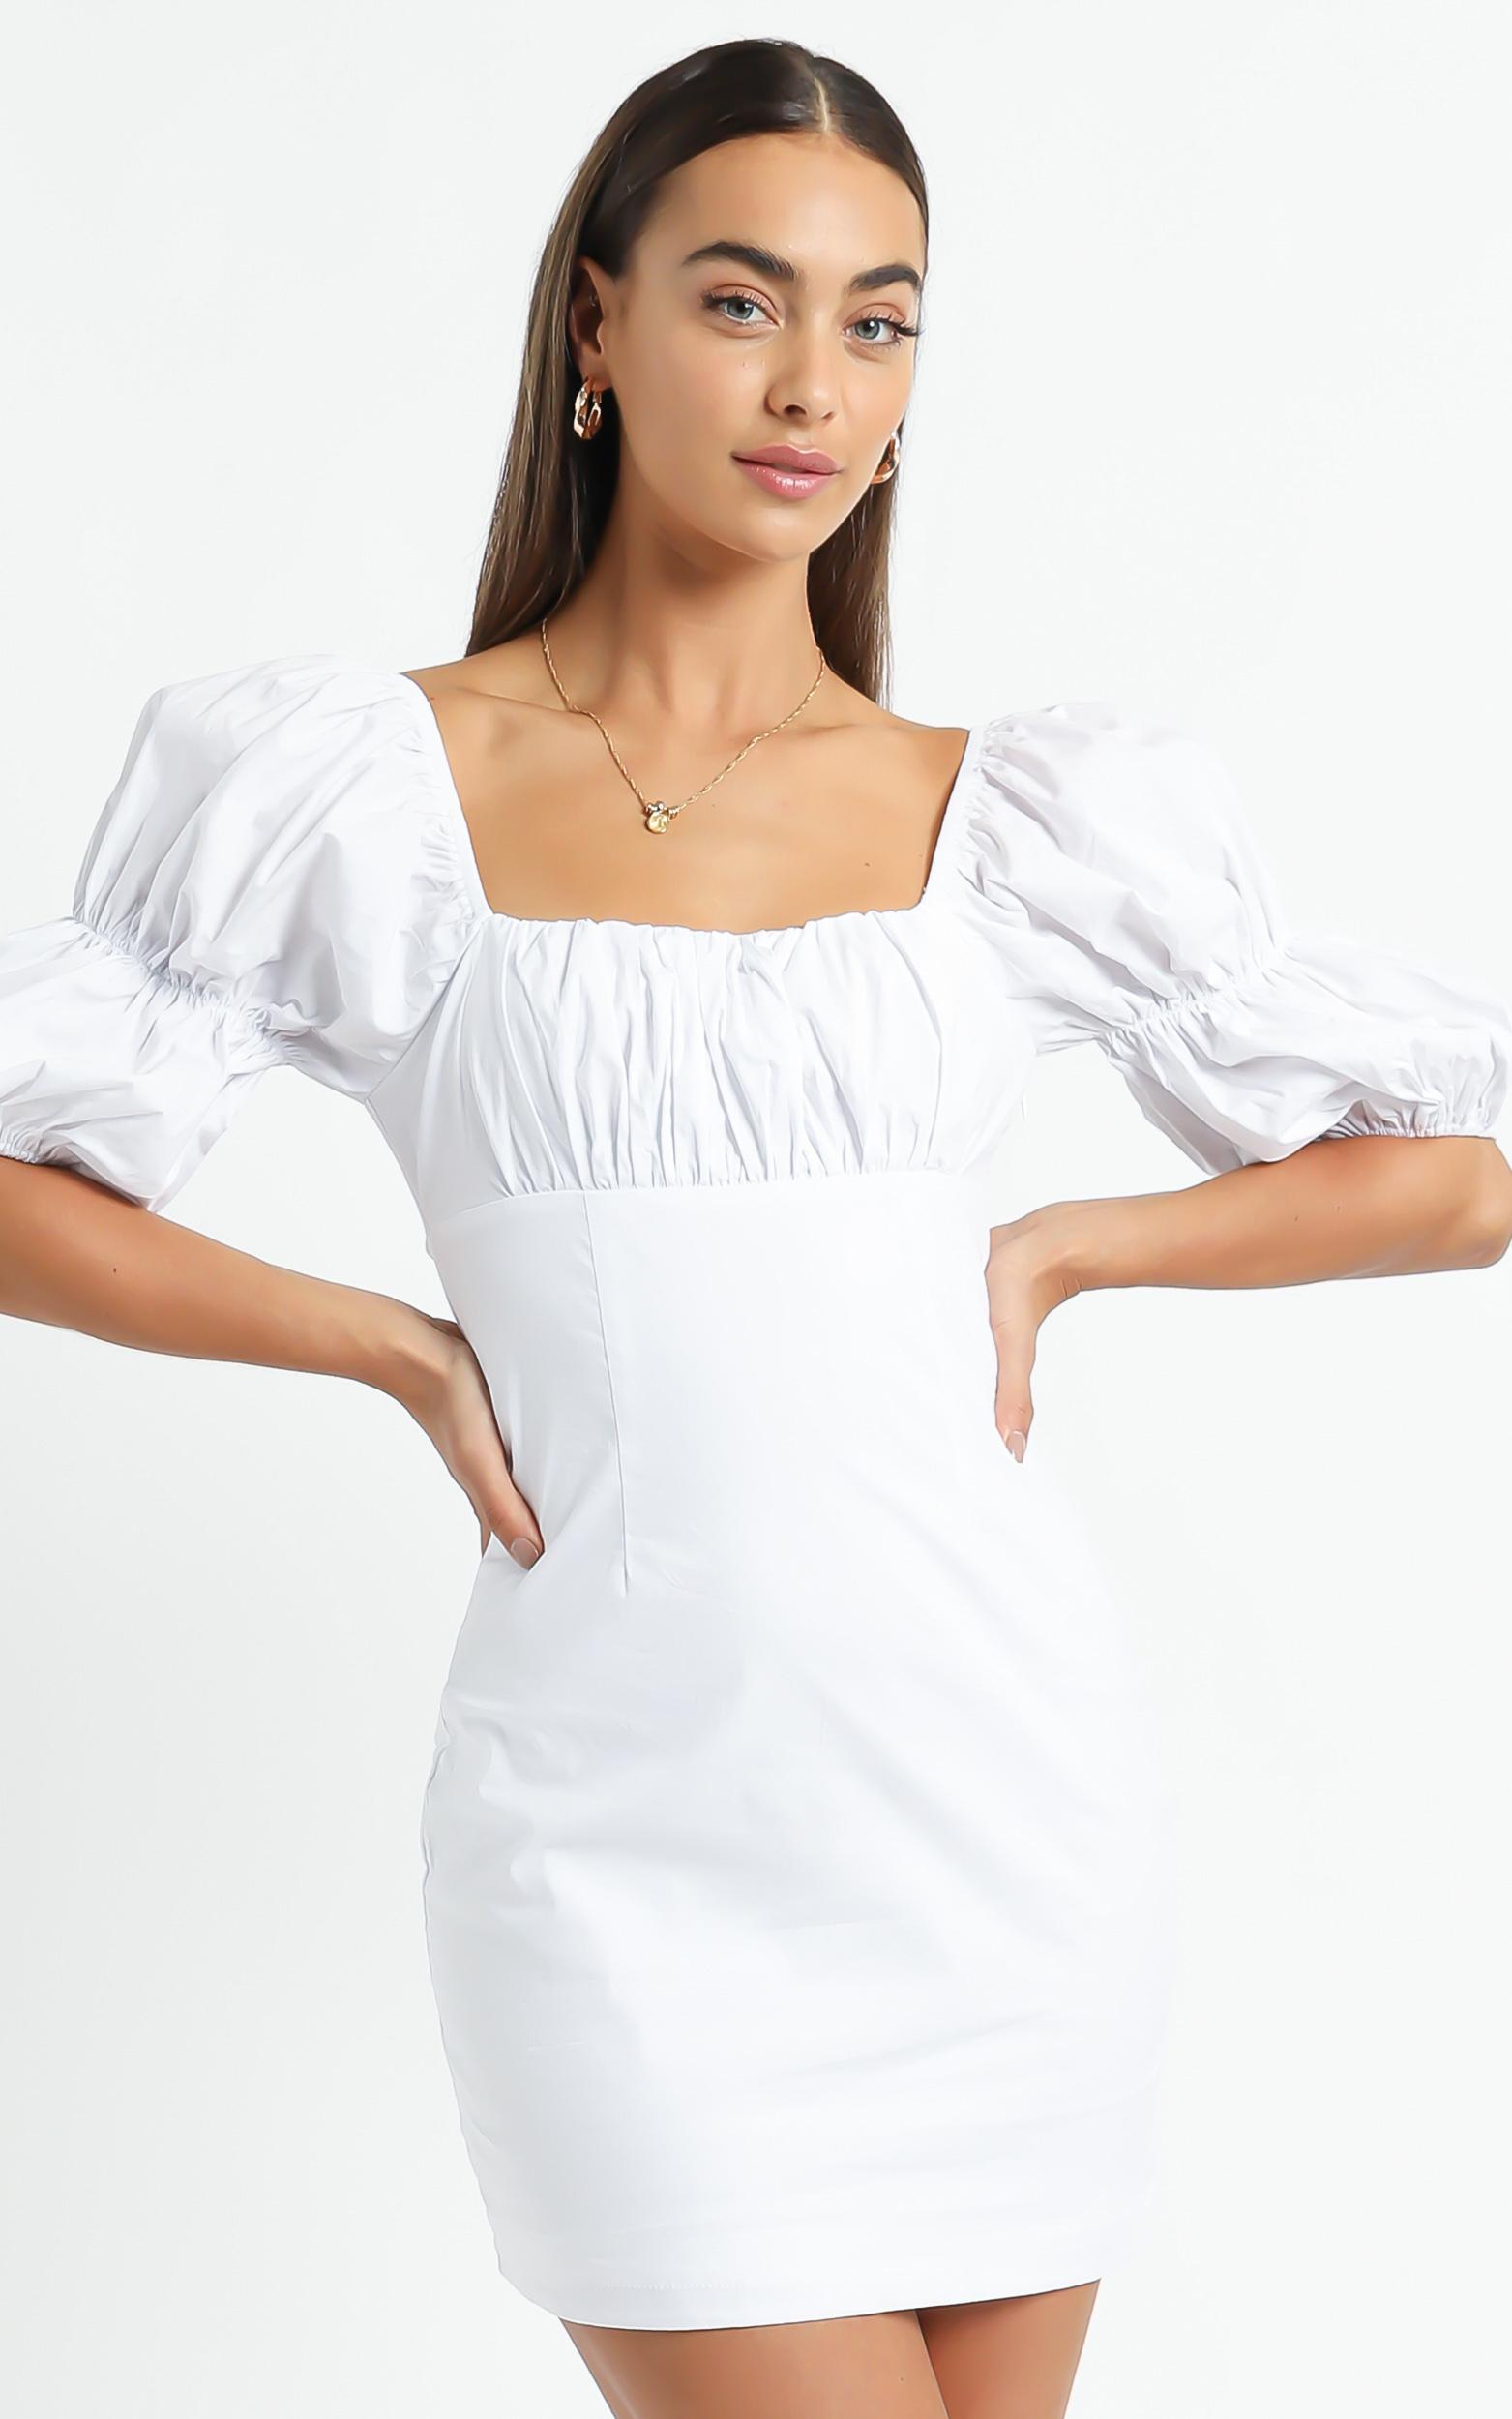 Adalira Dress in White - 6 (XS), White, hi-res image number null